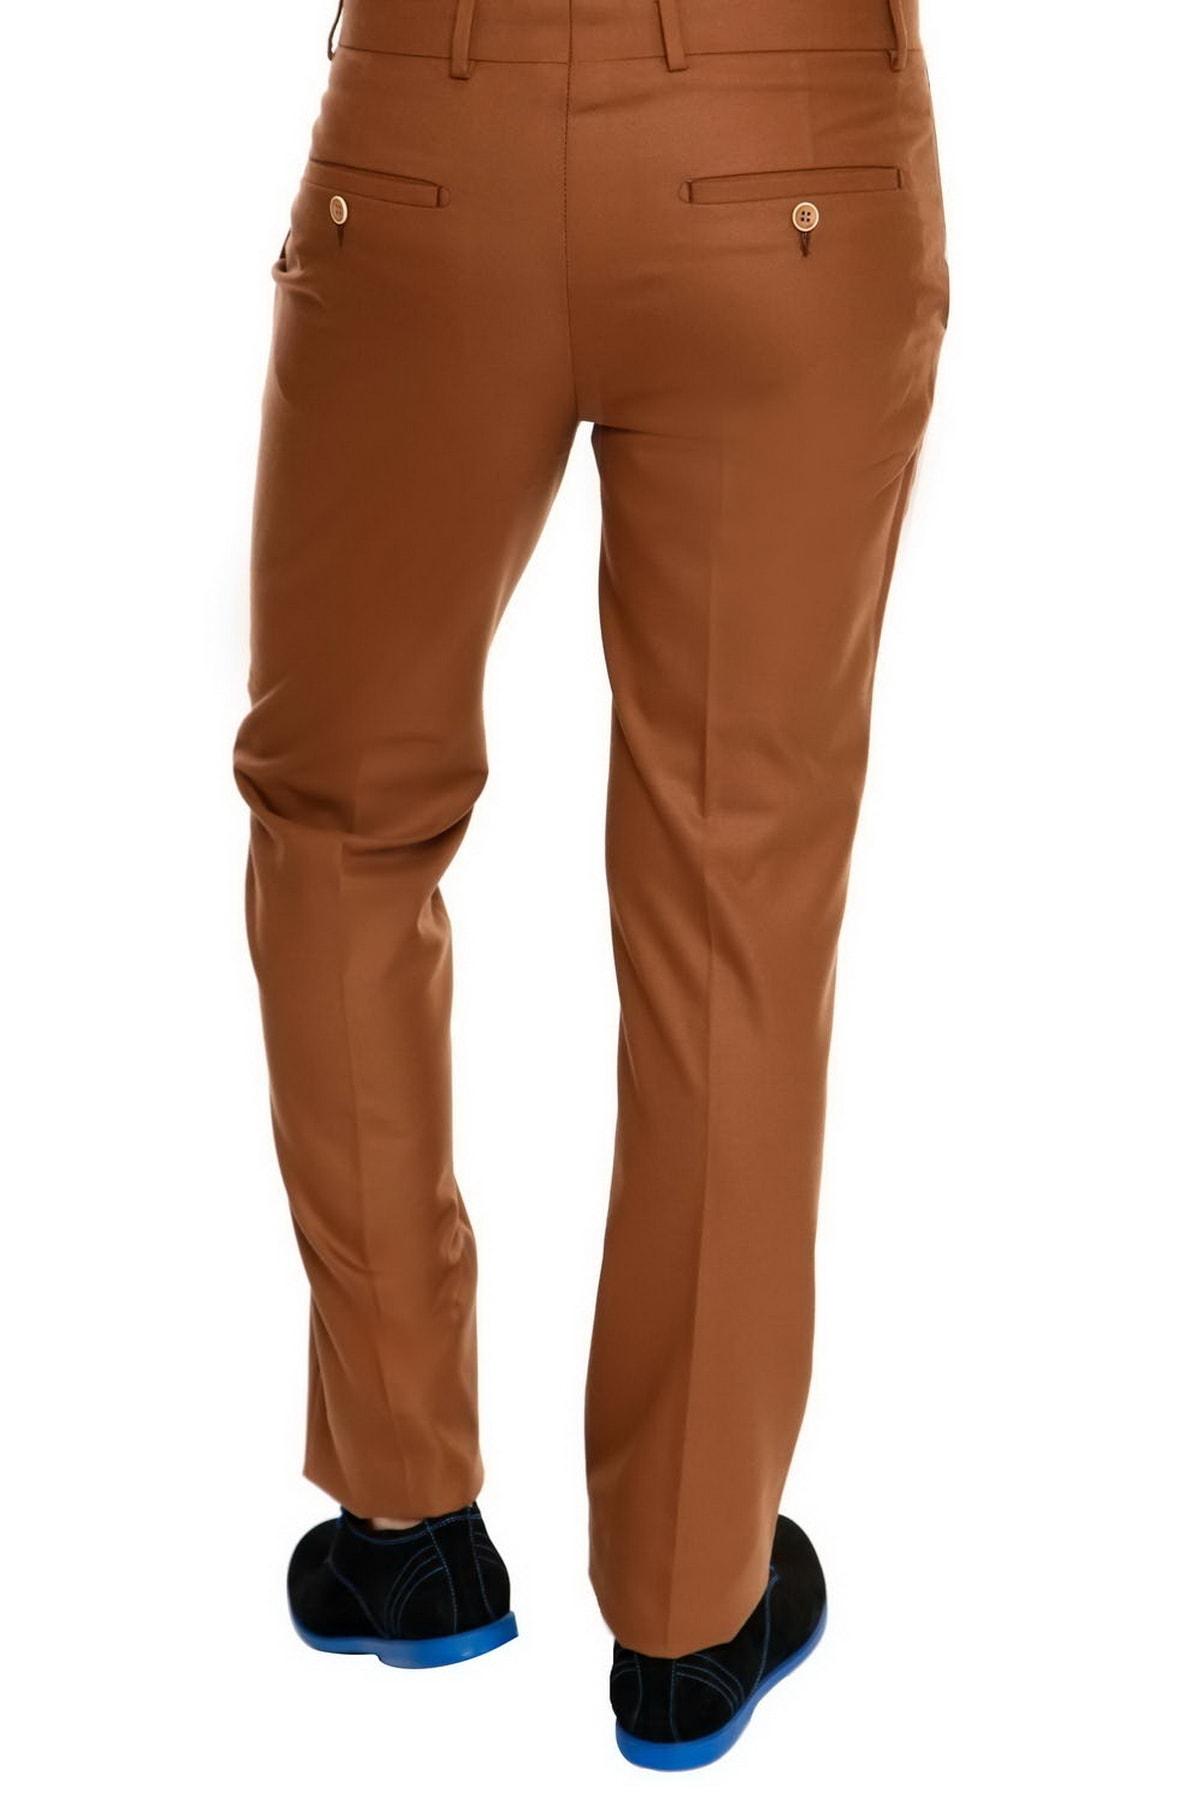 Efor Erkek Taba Slim Fit  Klasik Pantolon P 828